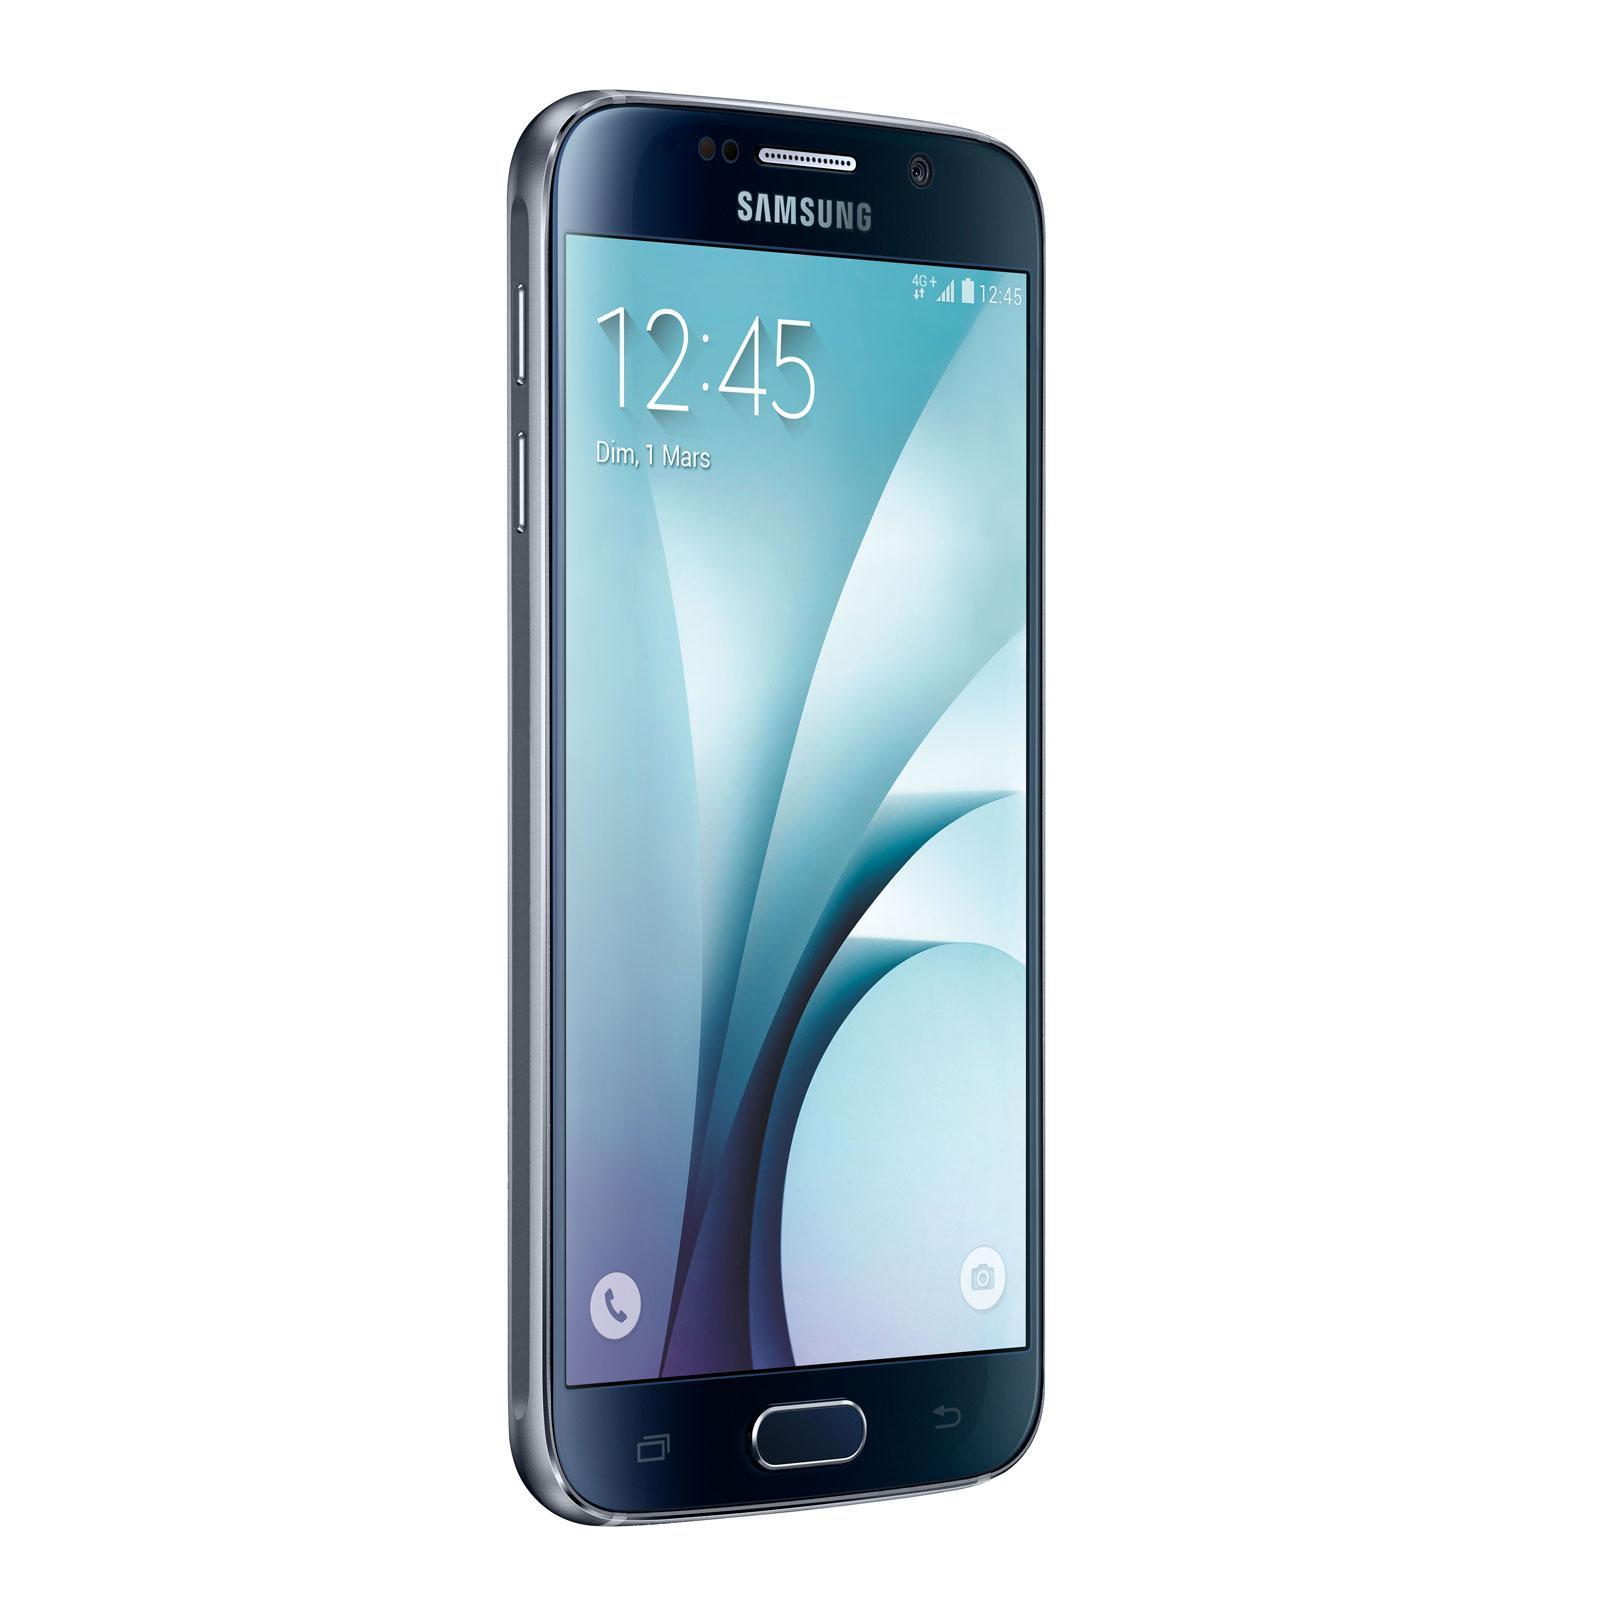 "Smartphone 5.1"" Samsung Galaxy S6 - Noir (avec ODR 50€)"